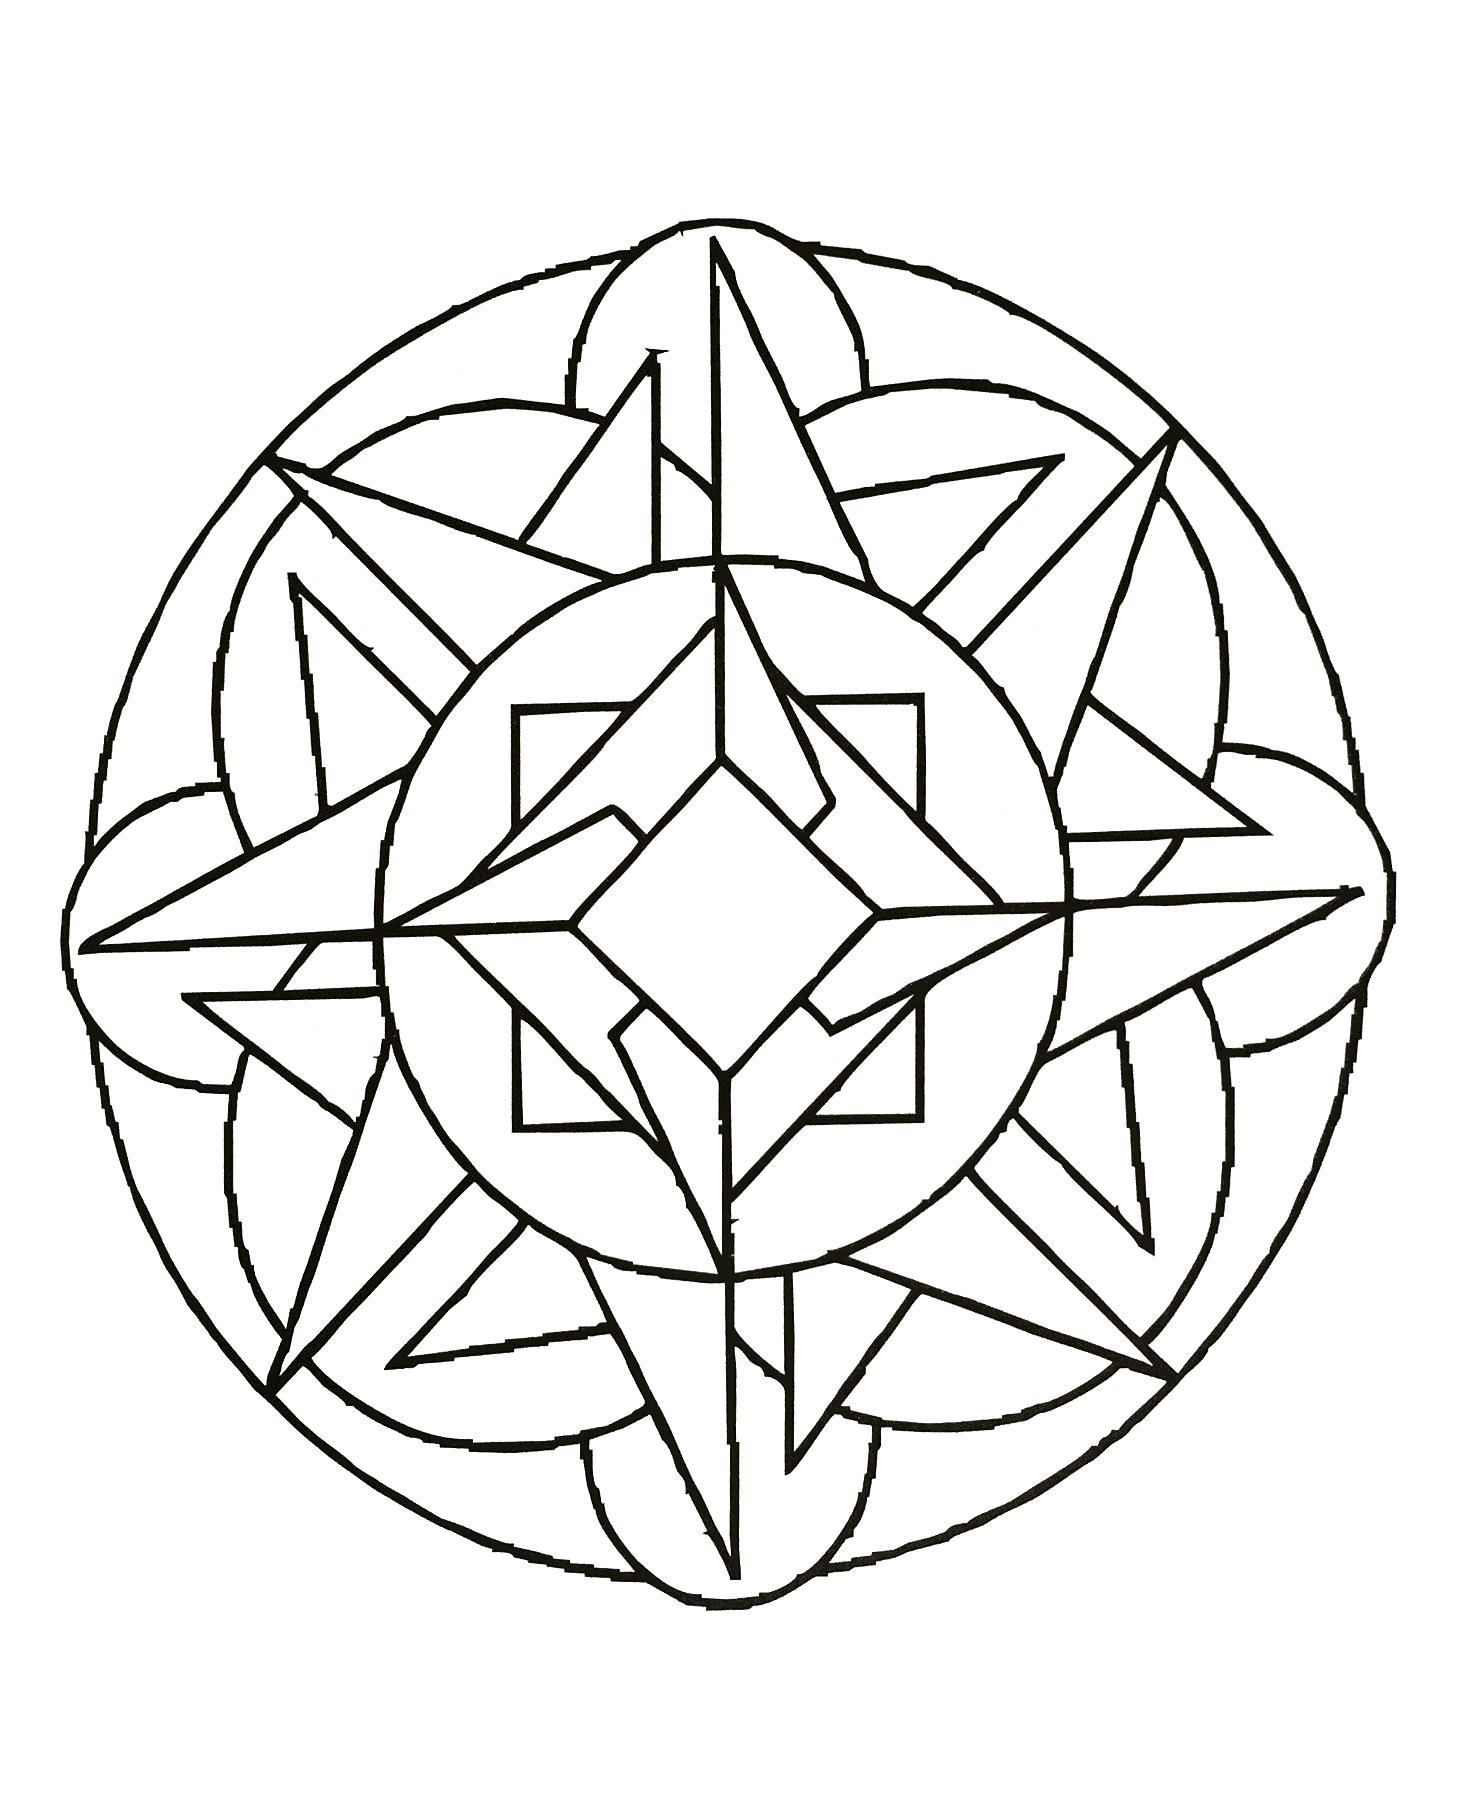 mandala gratuit formes geometriques simples mandalas avec motifs g om triques 100 mandalas. Black Bedroom Furniture Sets. Home Design Ideas